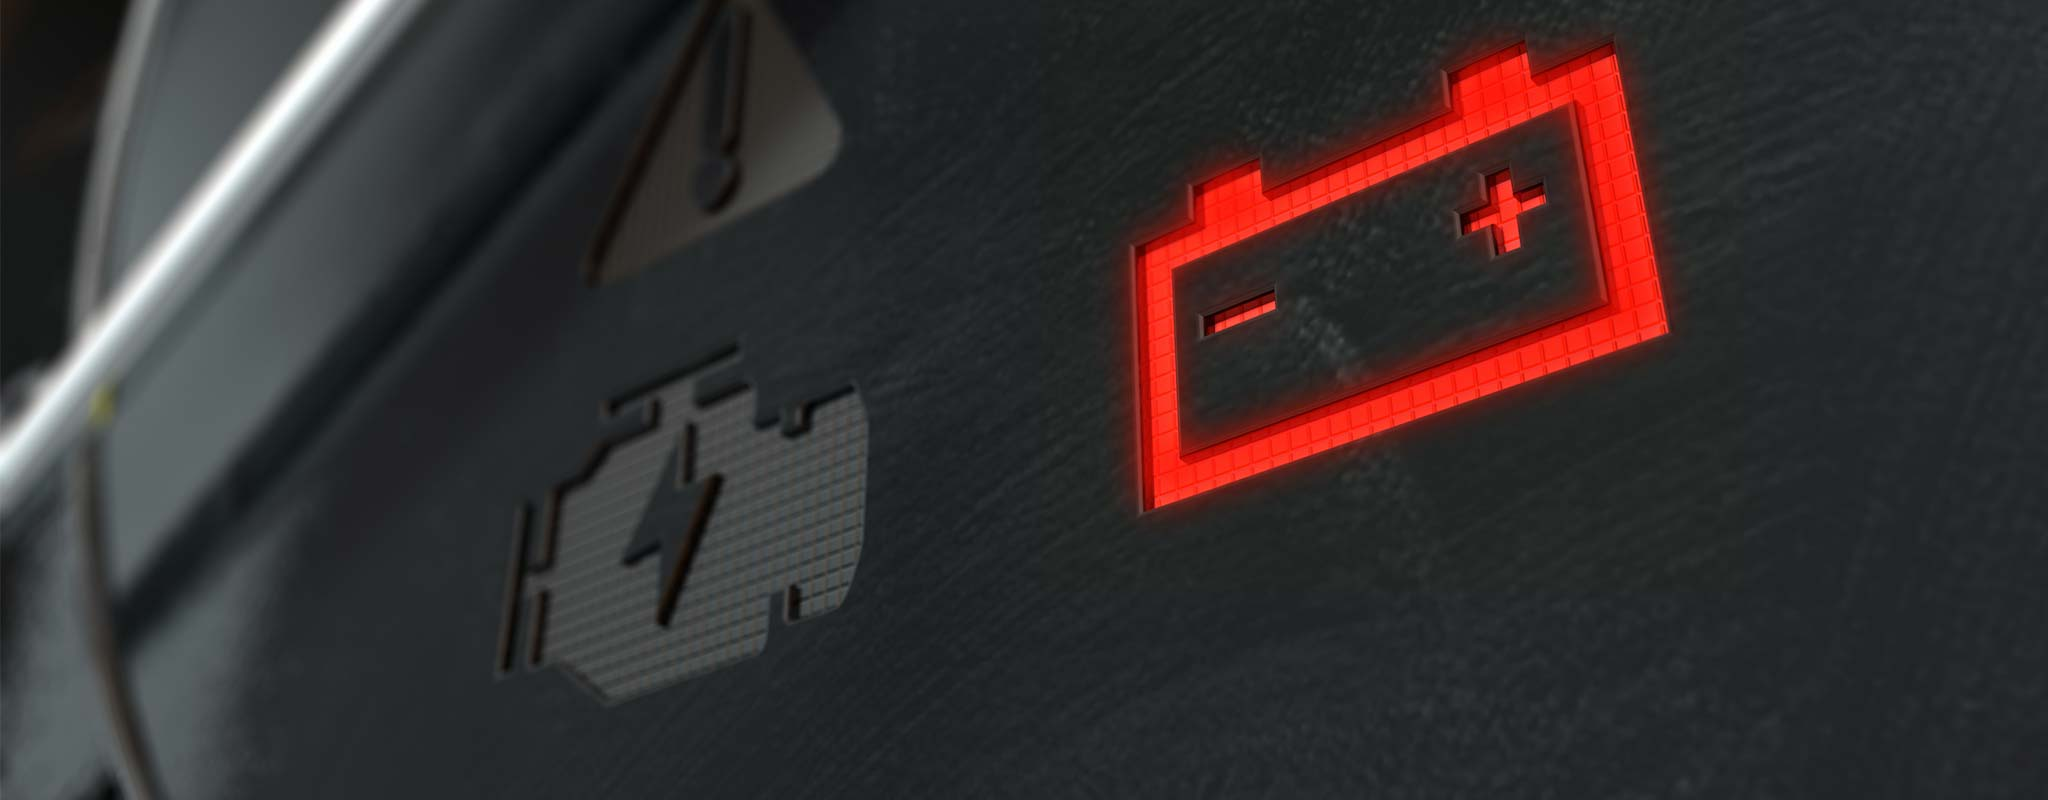 Car dash battery light